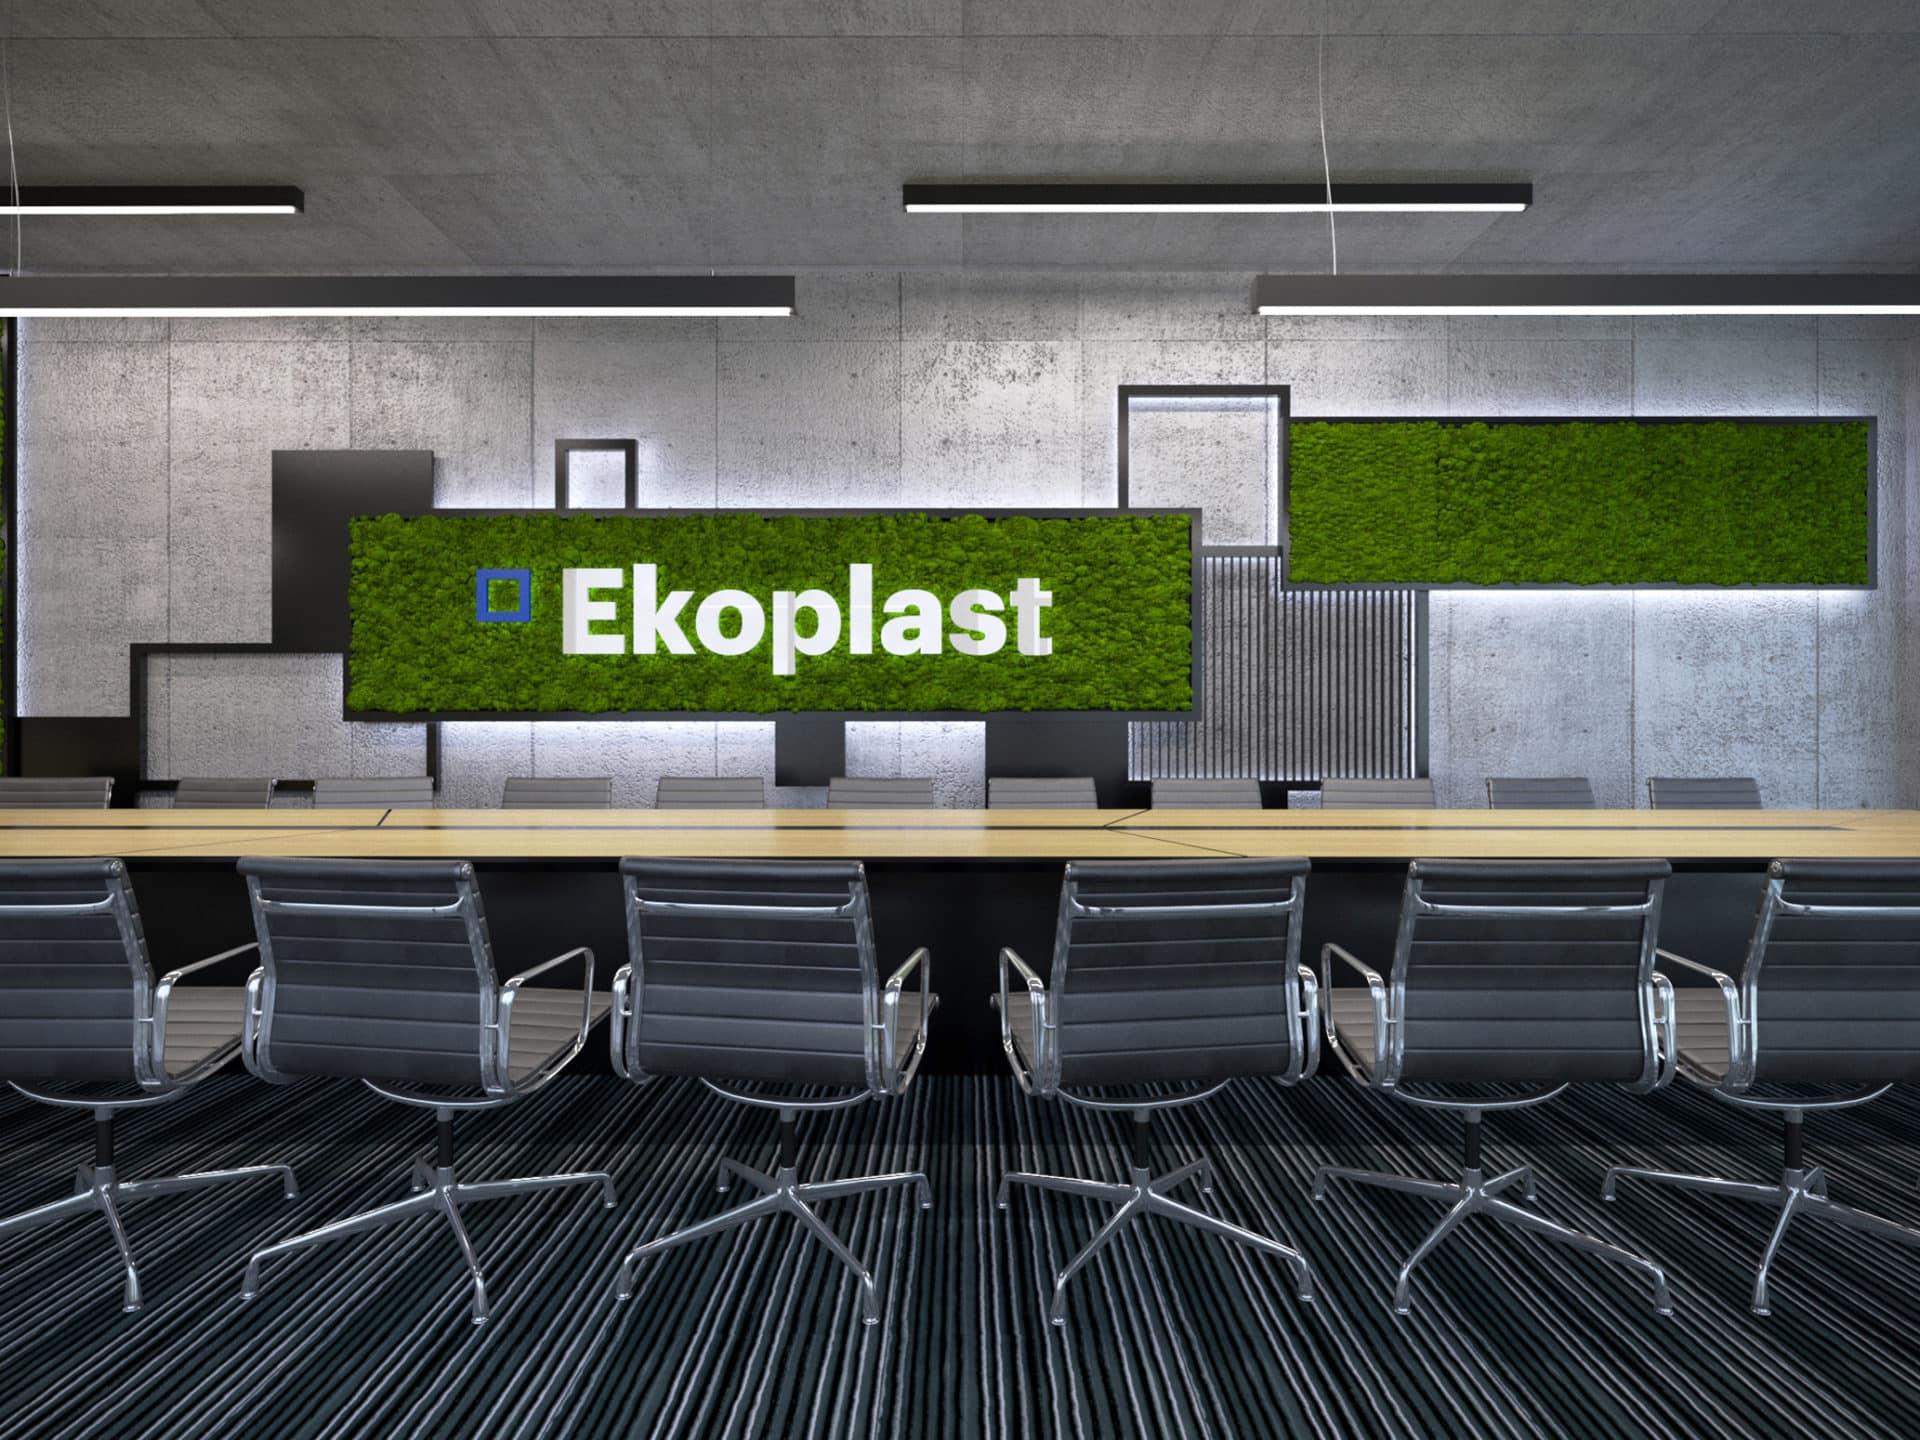 Ekoplast